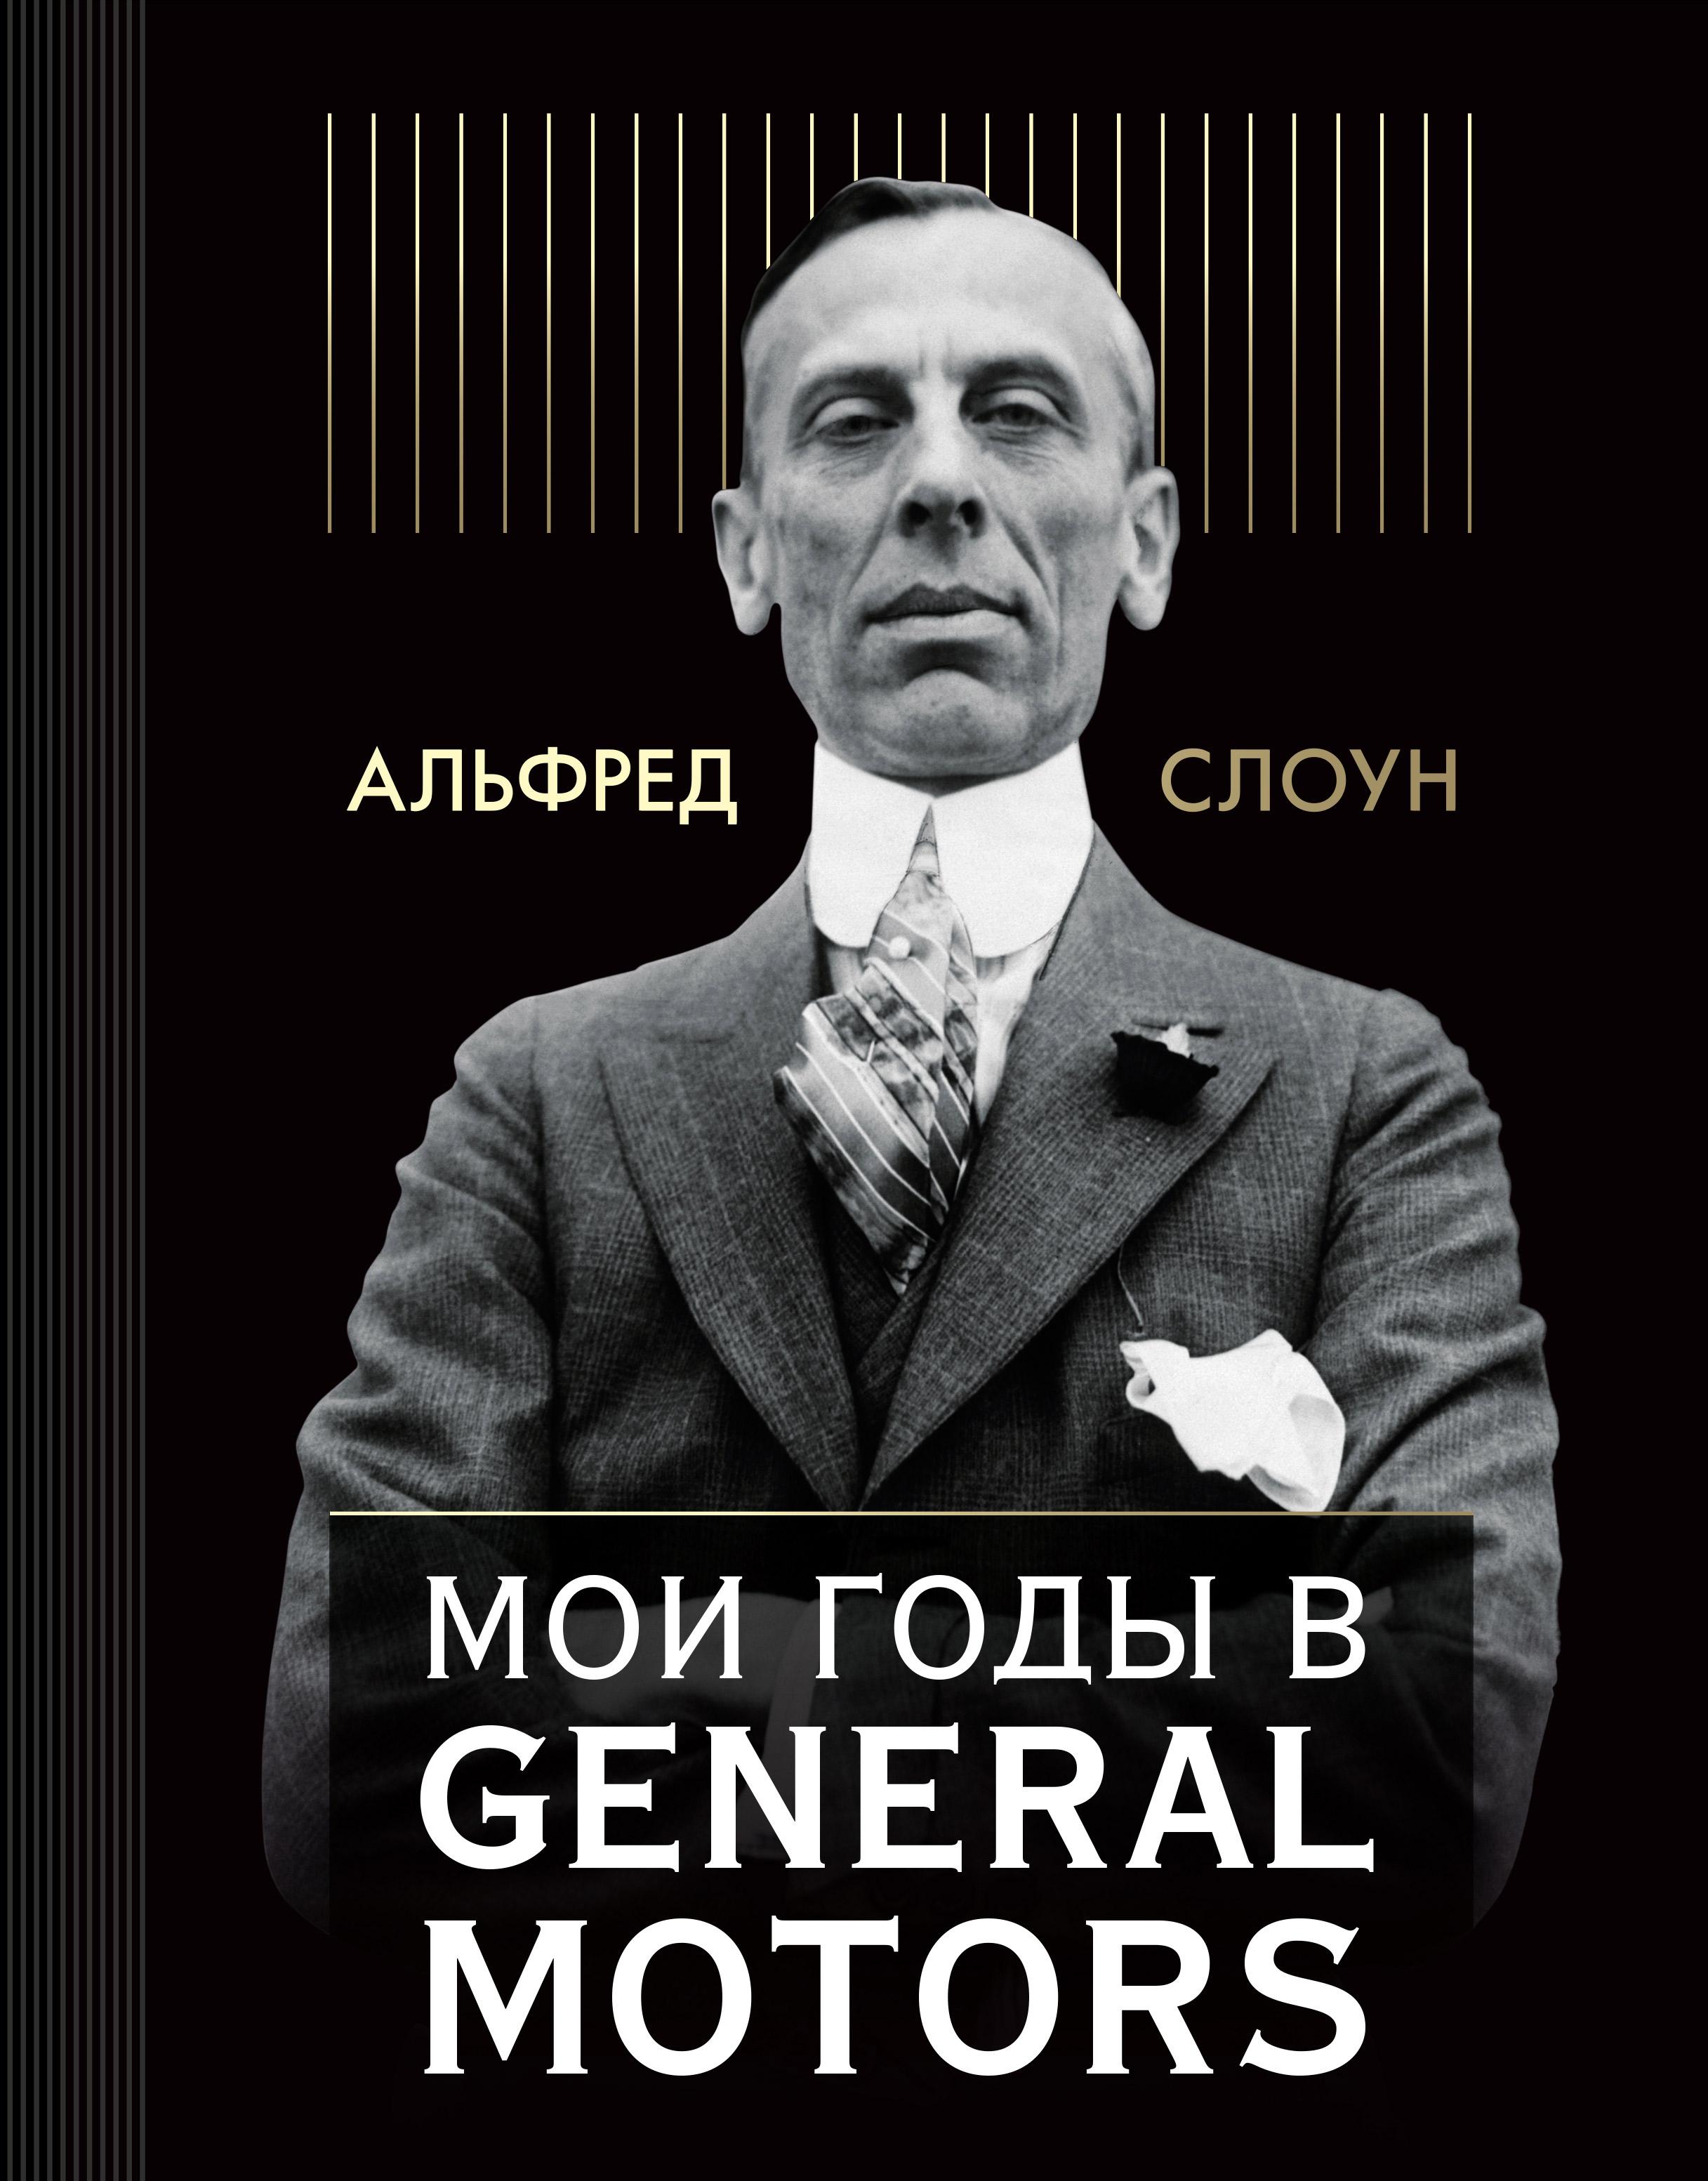 Альфред Слоун Мои годы в General Motors general motors module 24243086